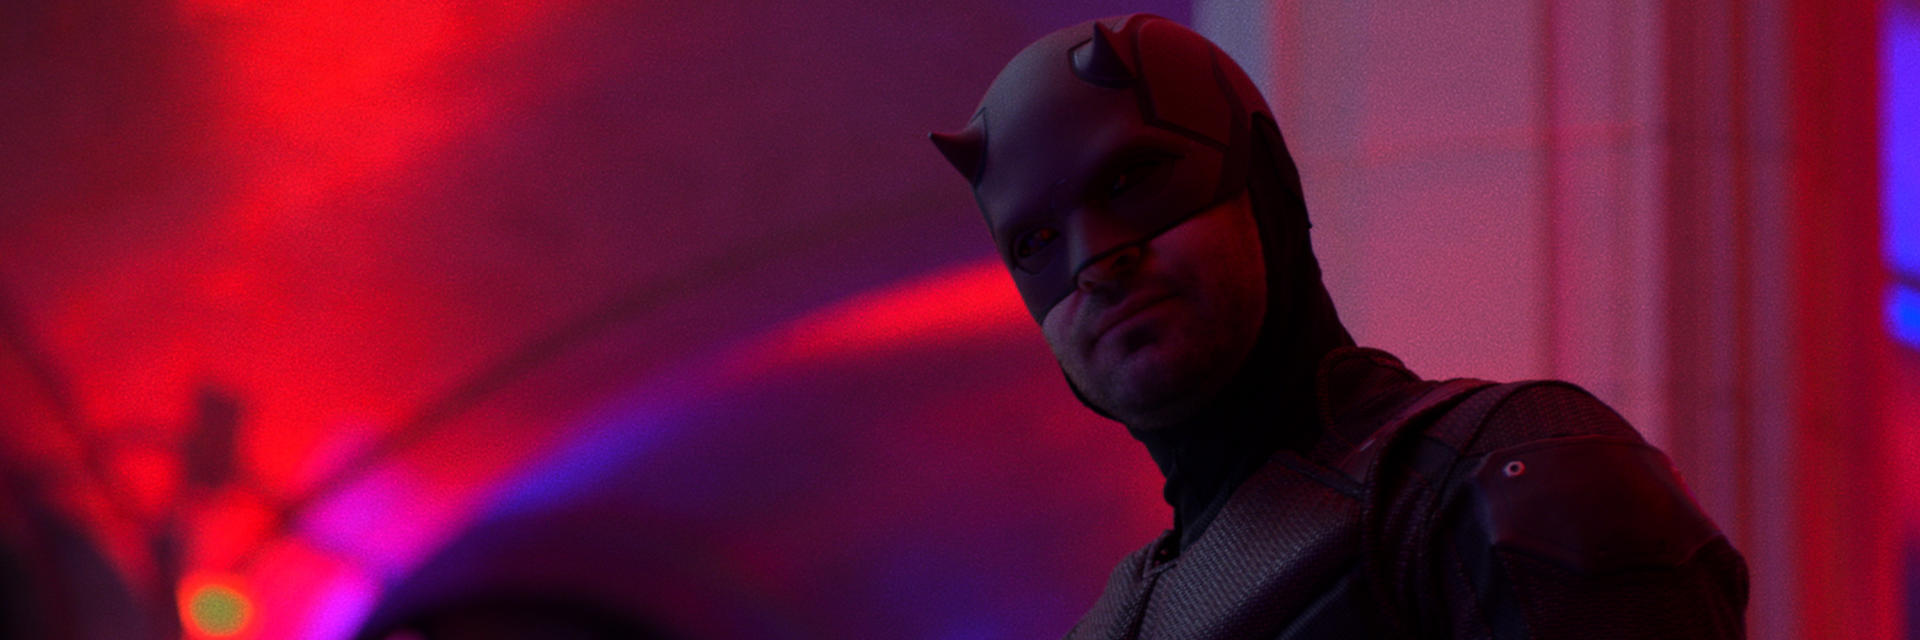 Daredevil (Matthew Murdock) | Characters | Marvel